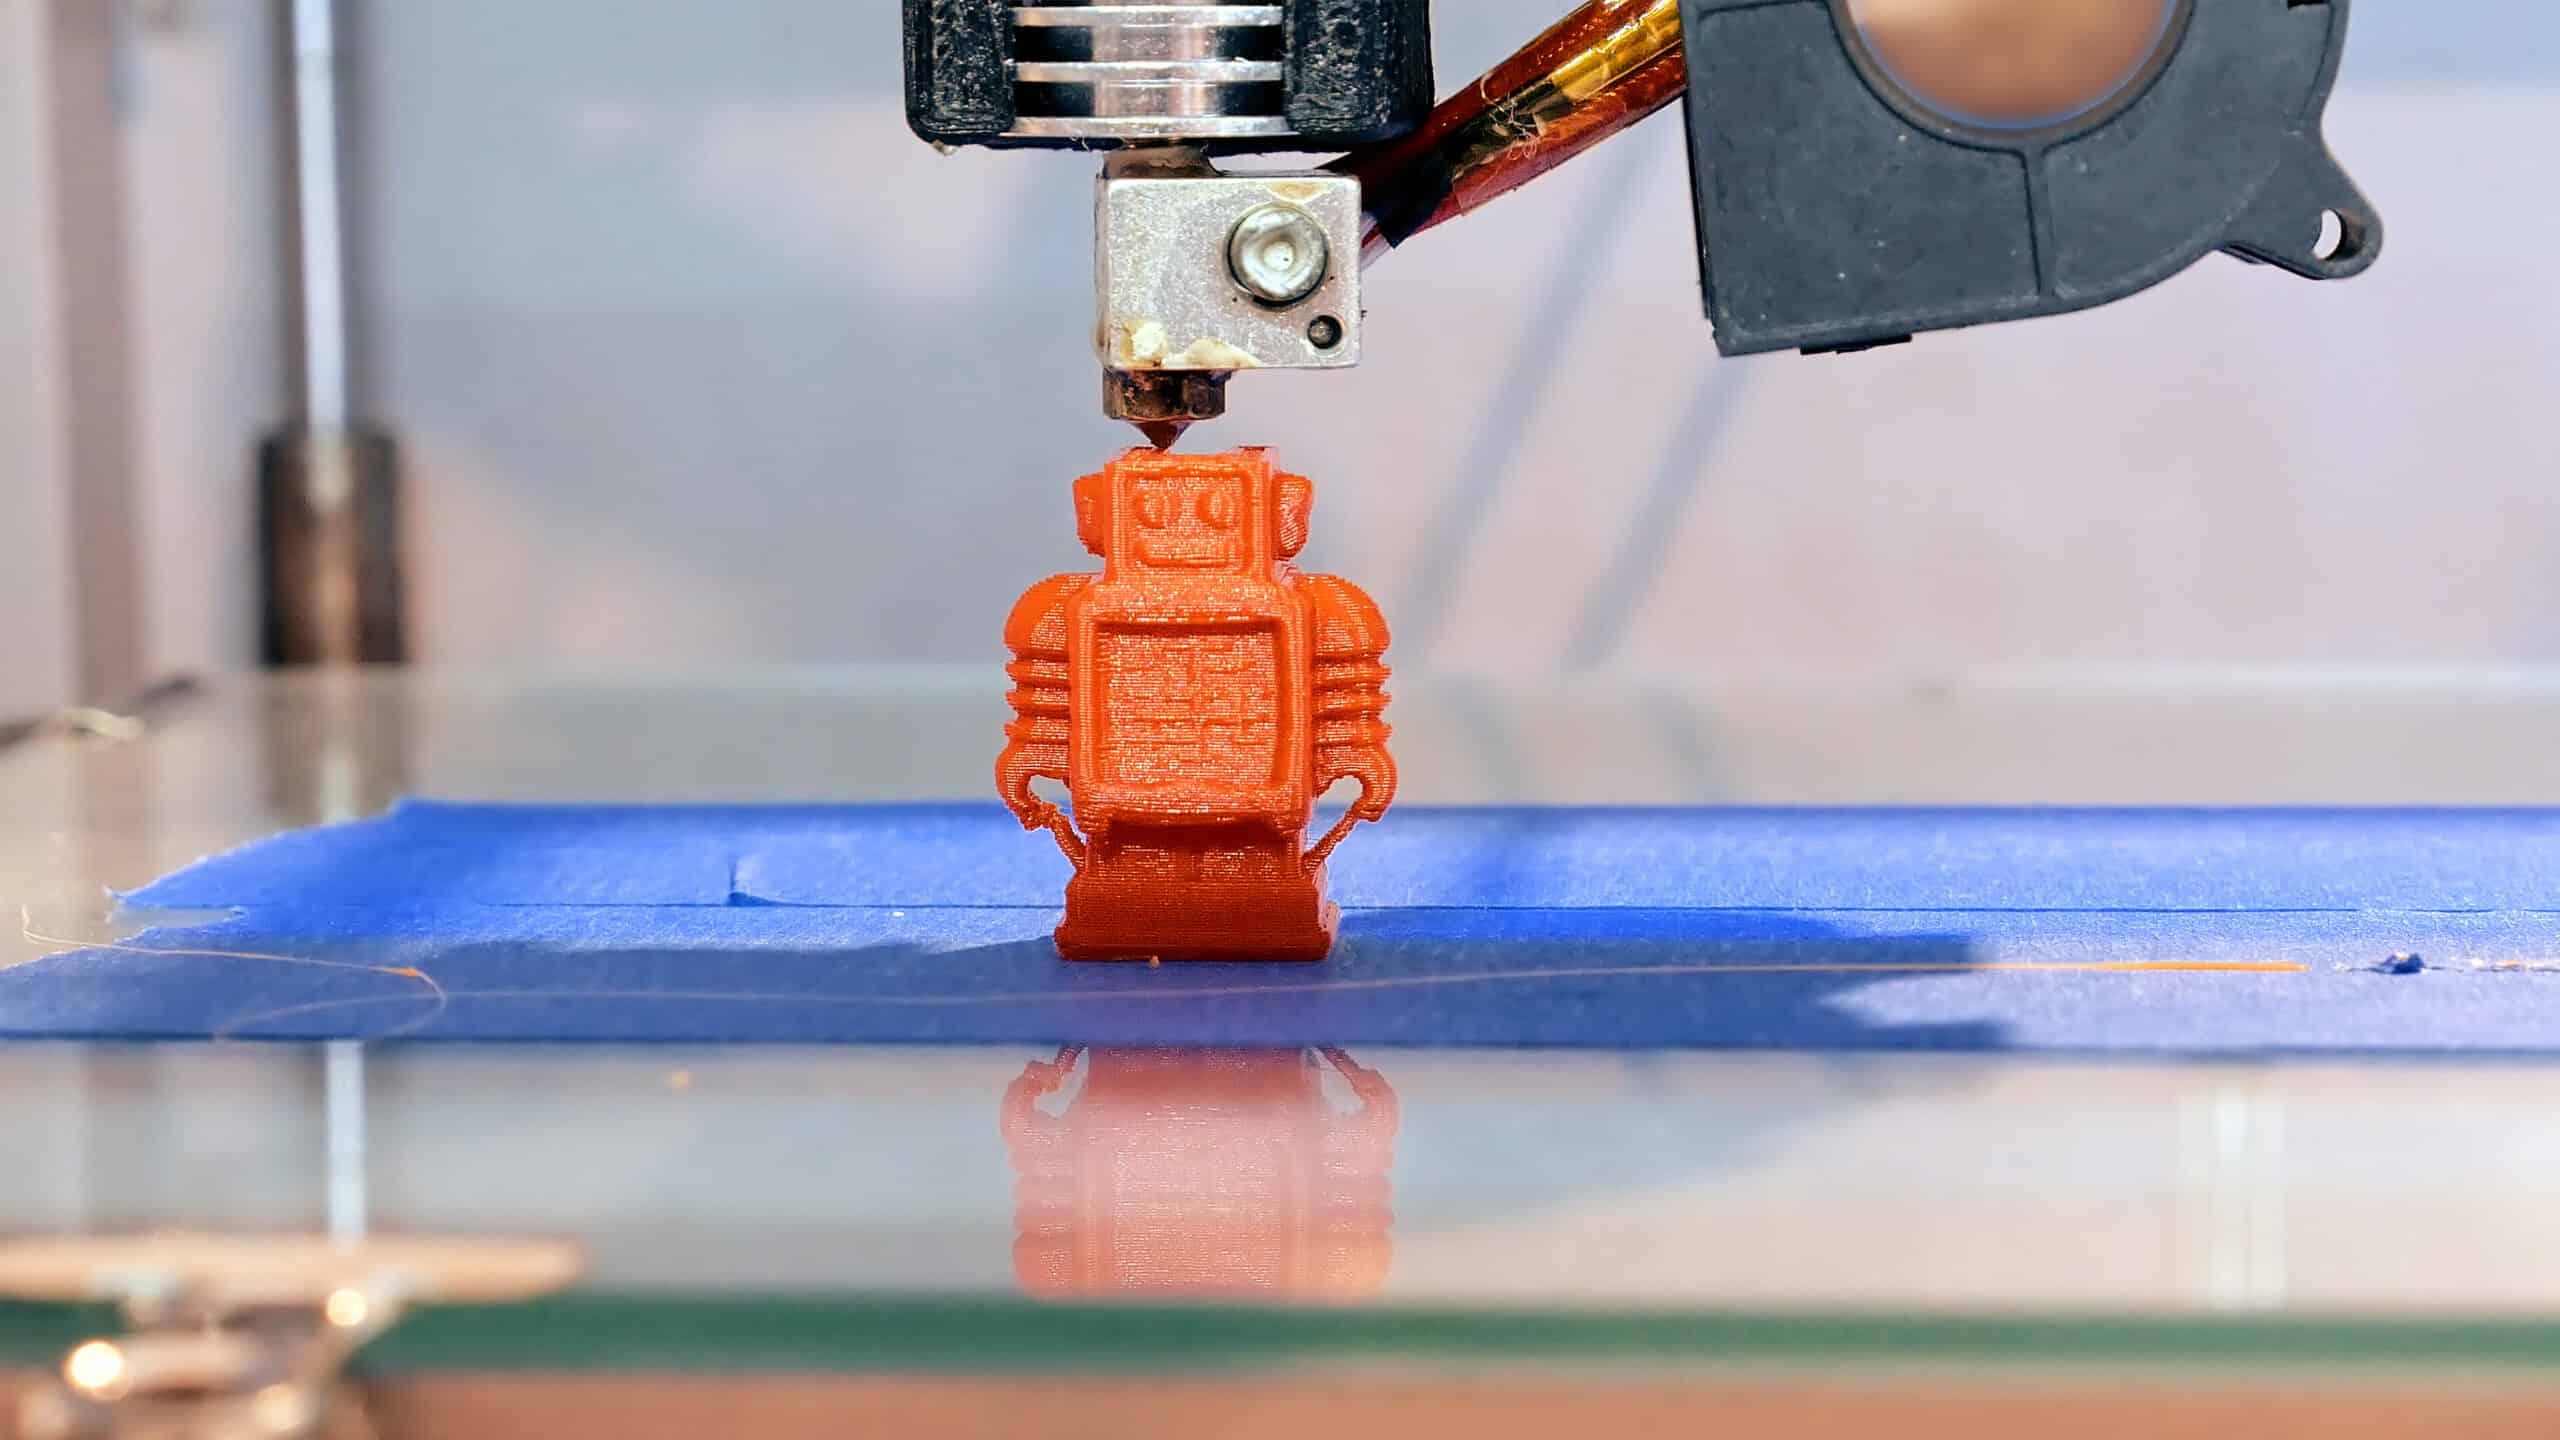 Best 3D Printer Kit Amazon